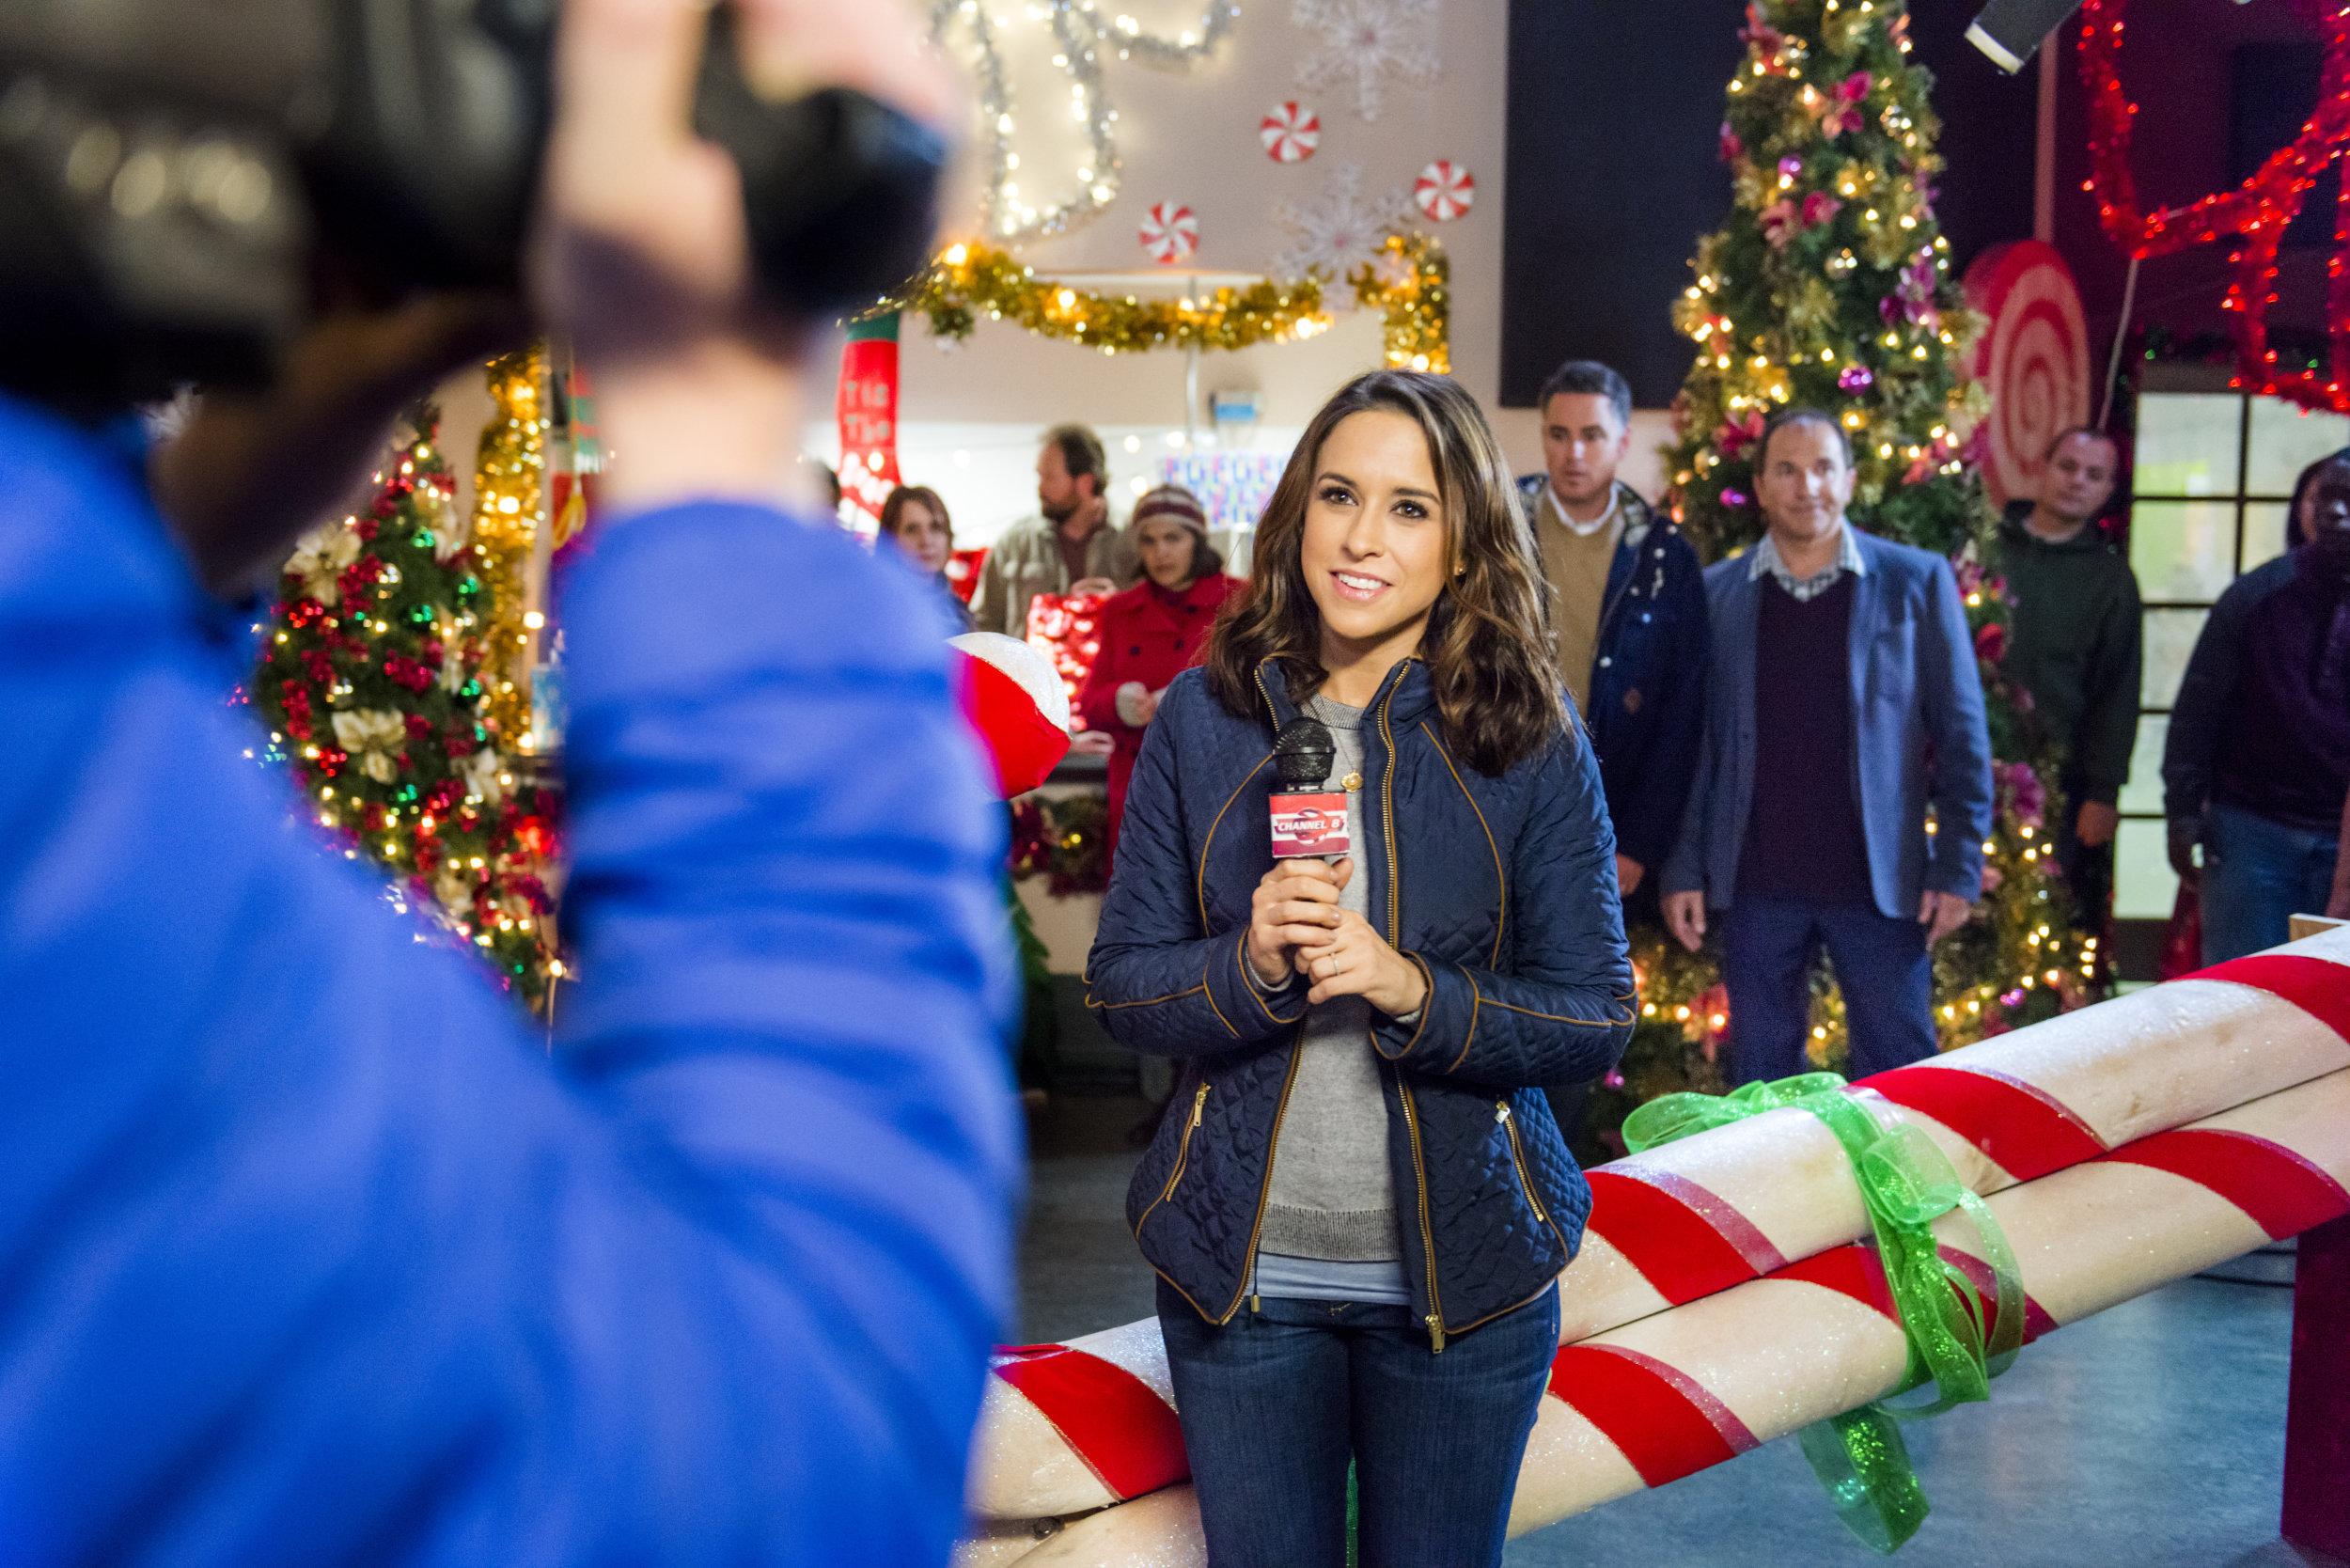 Family For Christmas.Video Family For Christmas Hallmark Channel